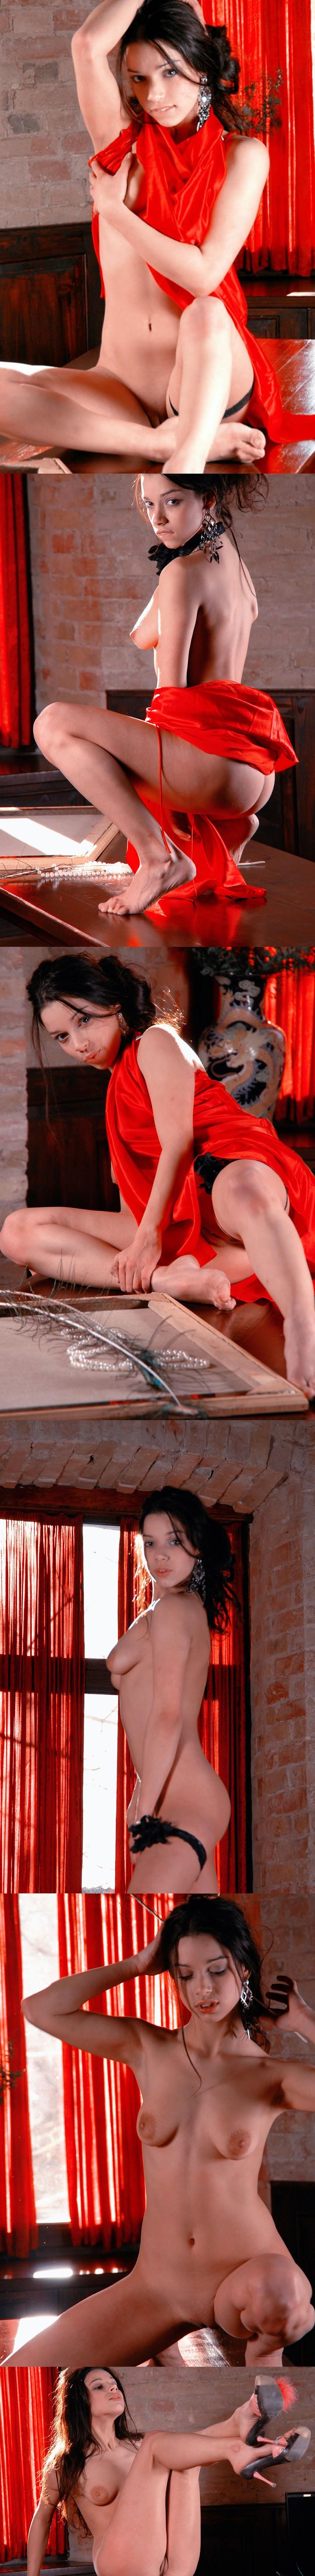 Met-Art MA 20080411 - Sindi A - Amicizie - by Alexander Voronin